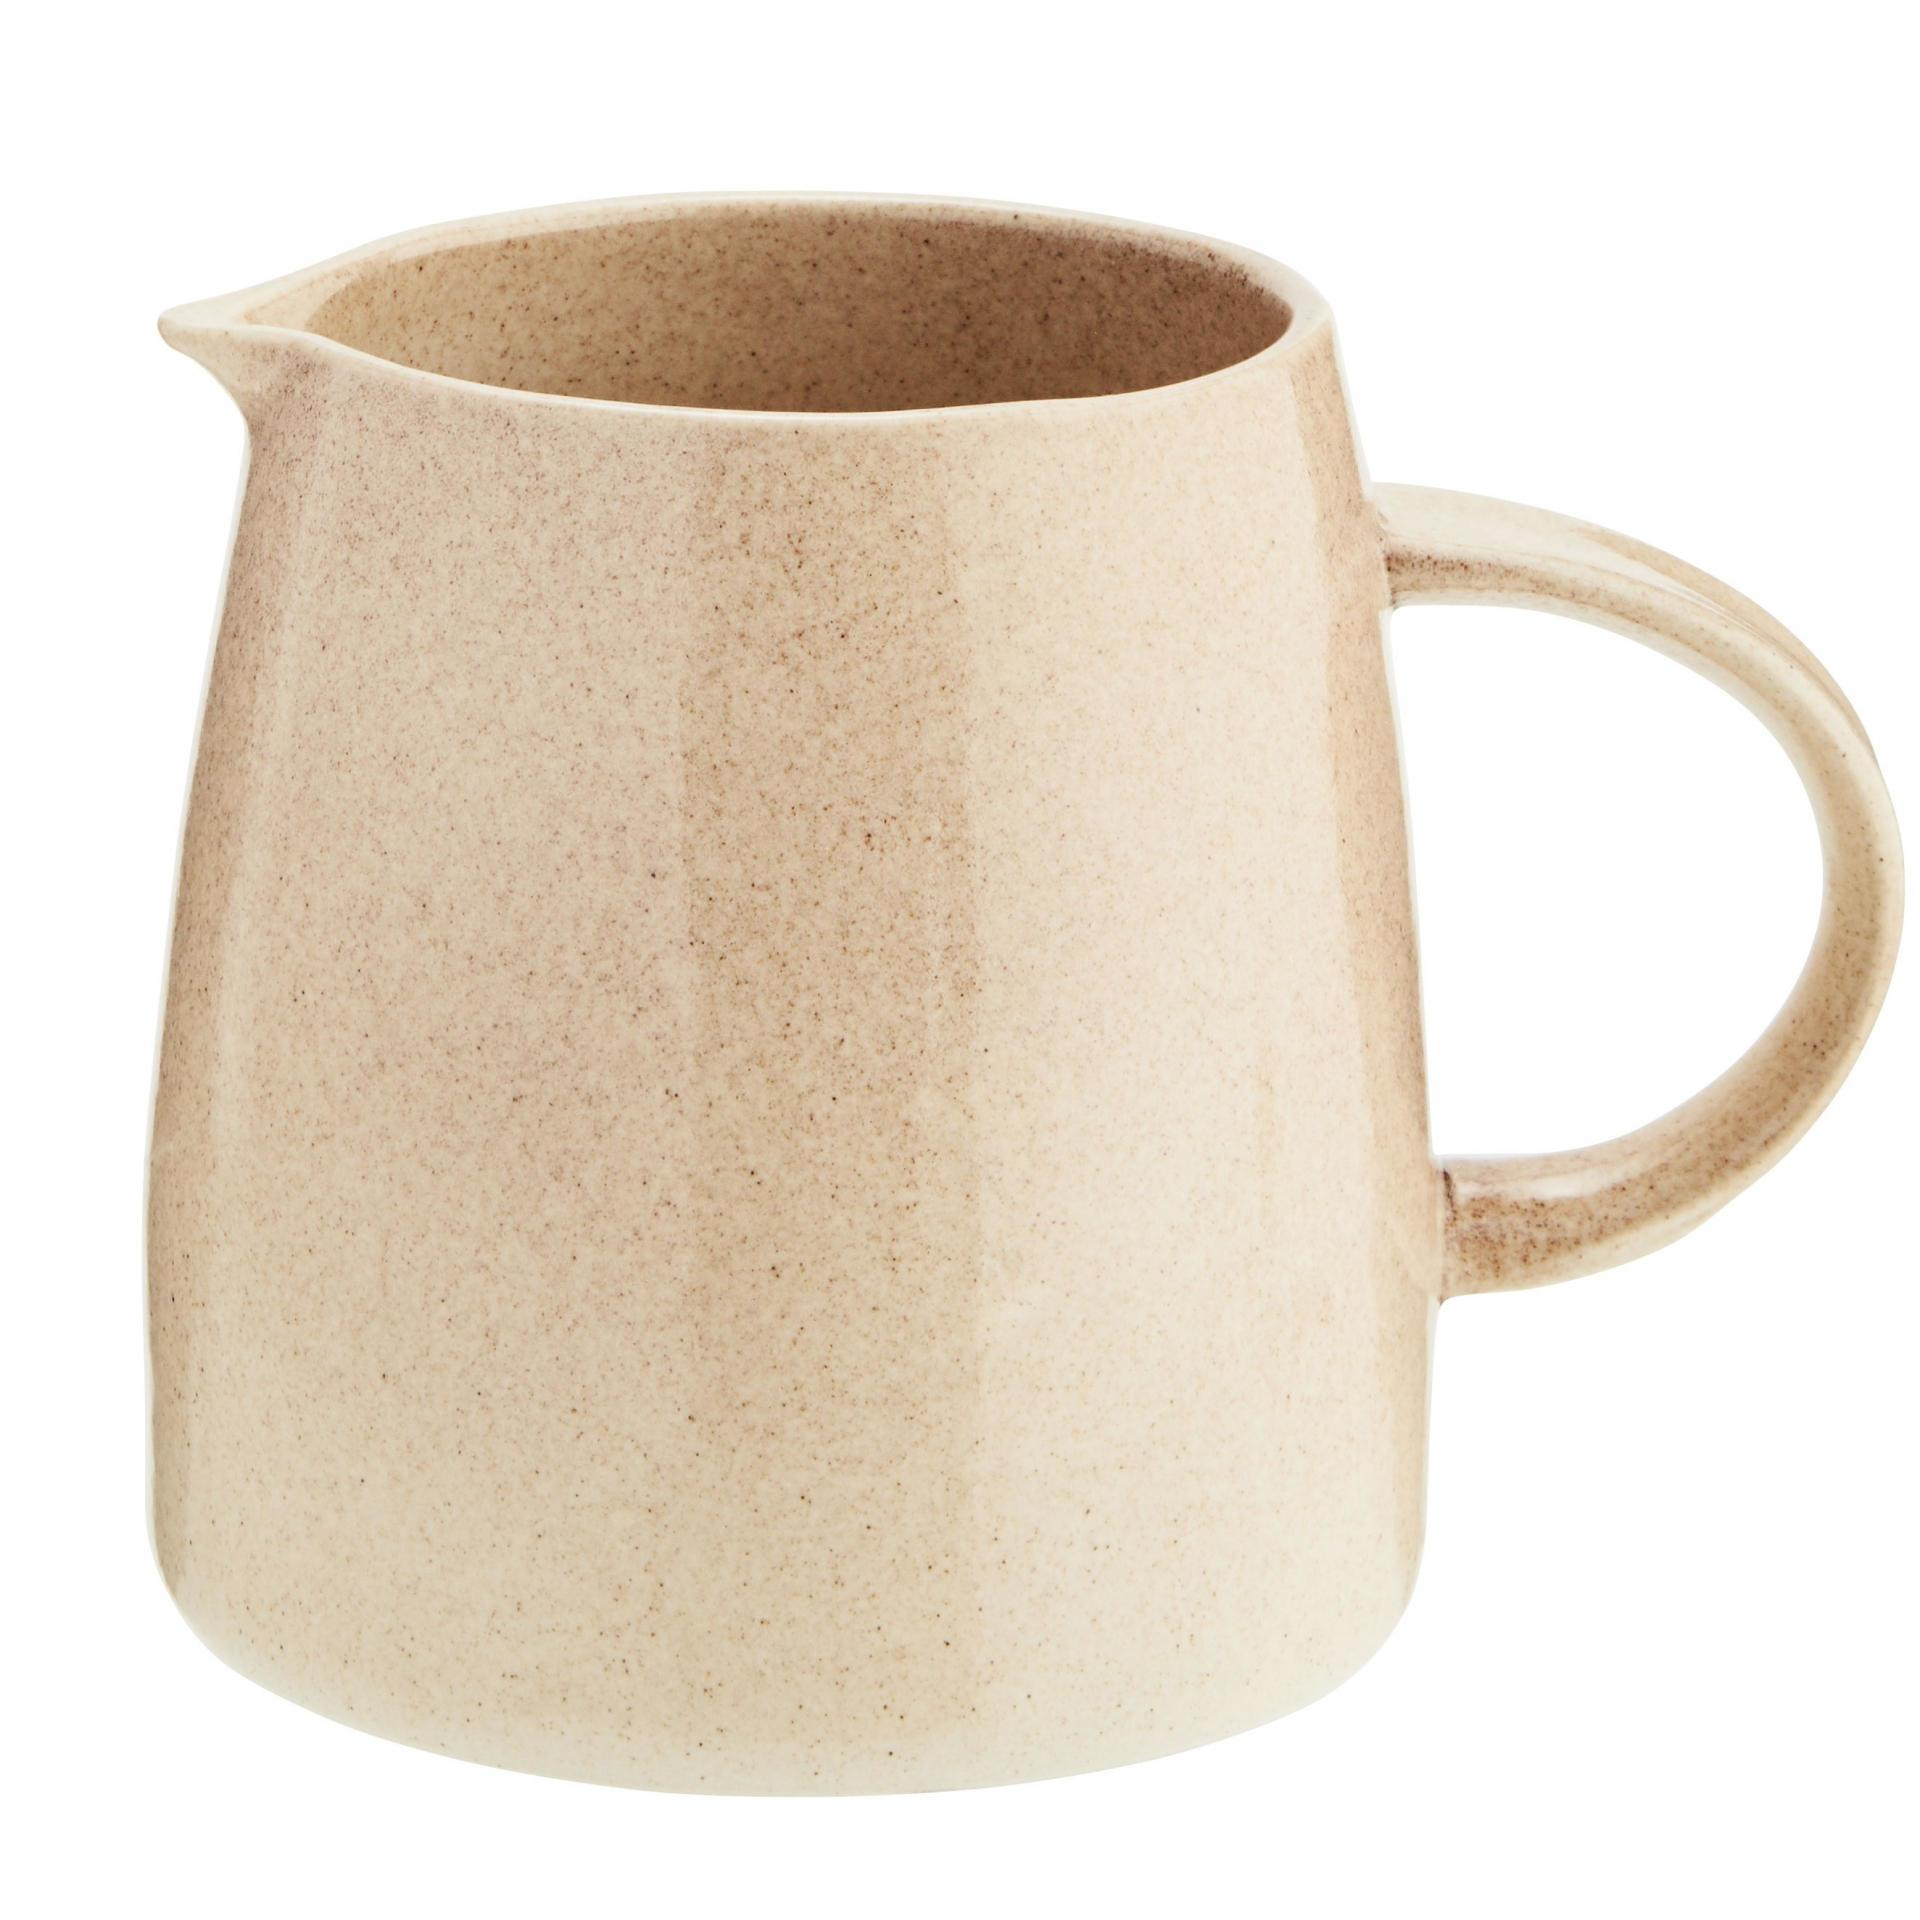 MADAM STOLTZ Kameninový džbán Powder, béžová barva, krémová barva, keramika